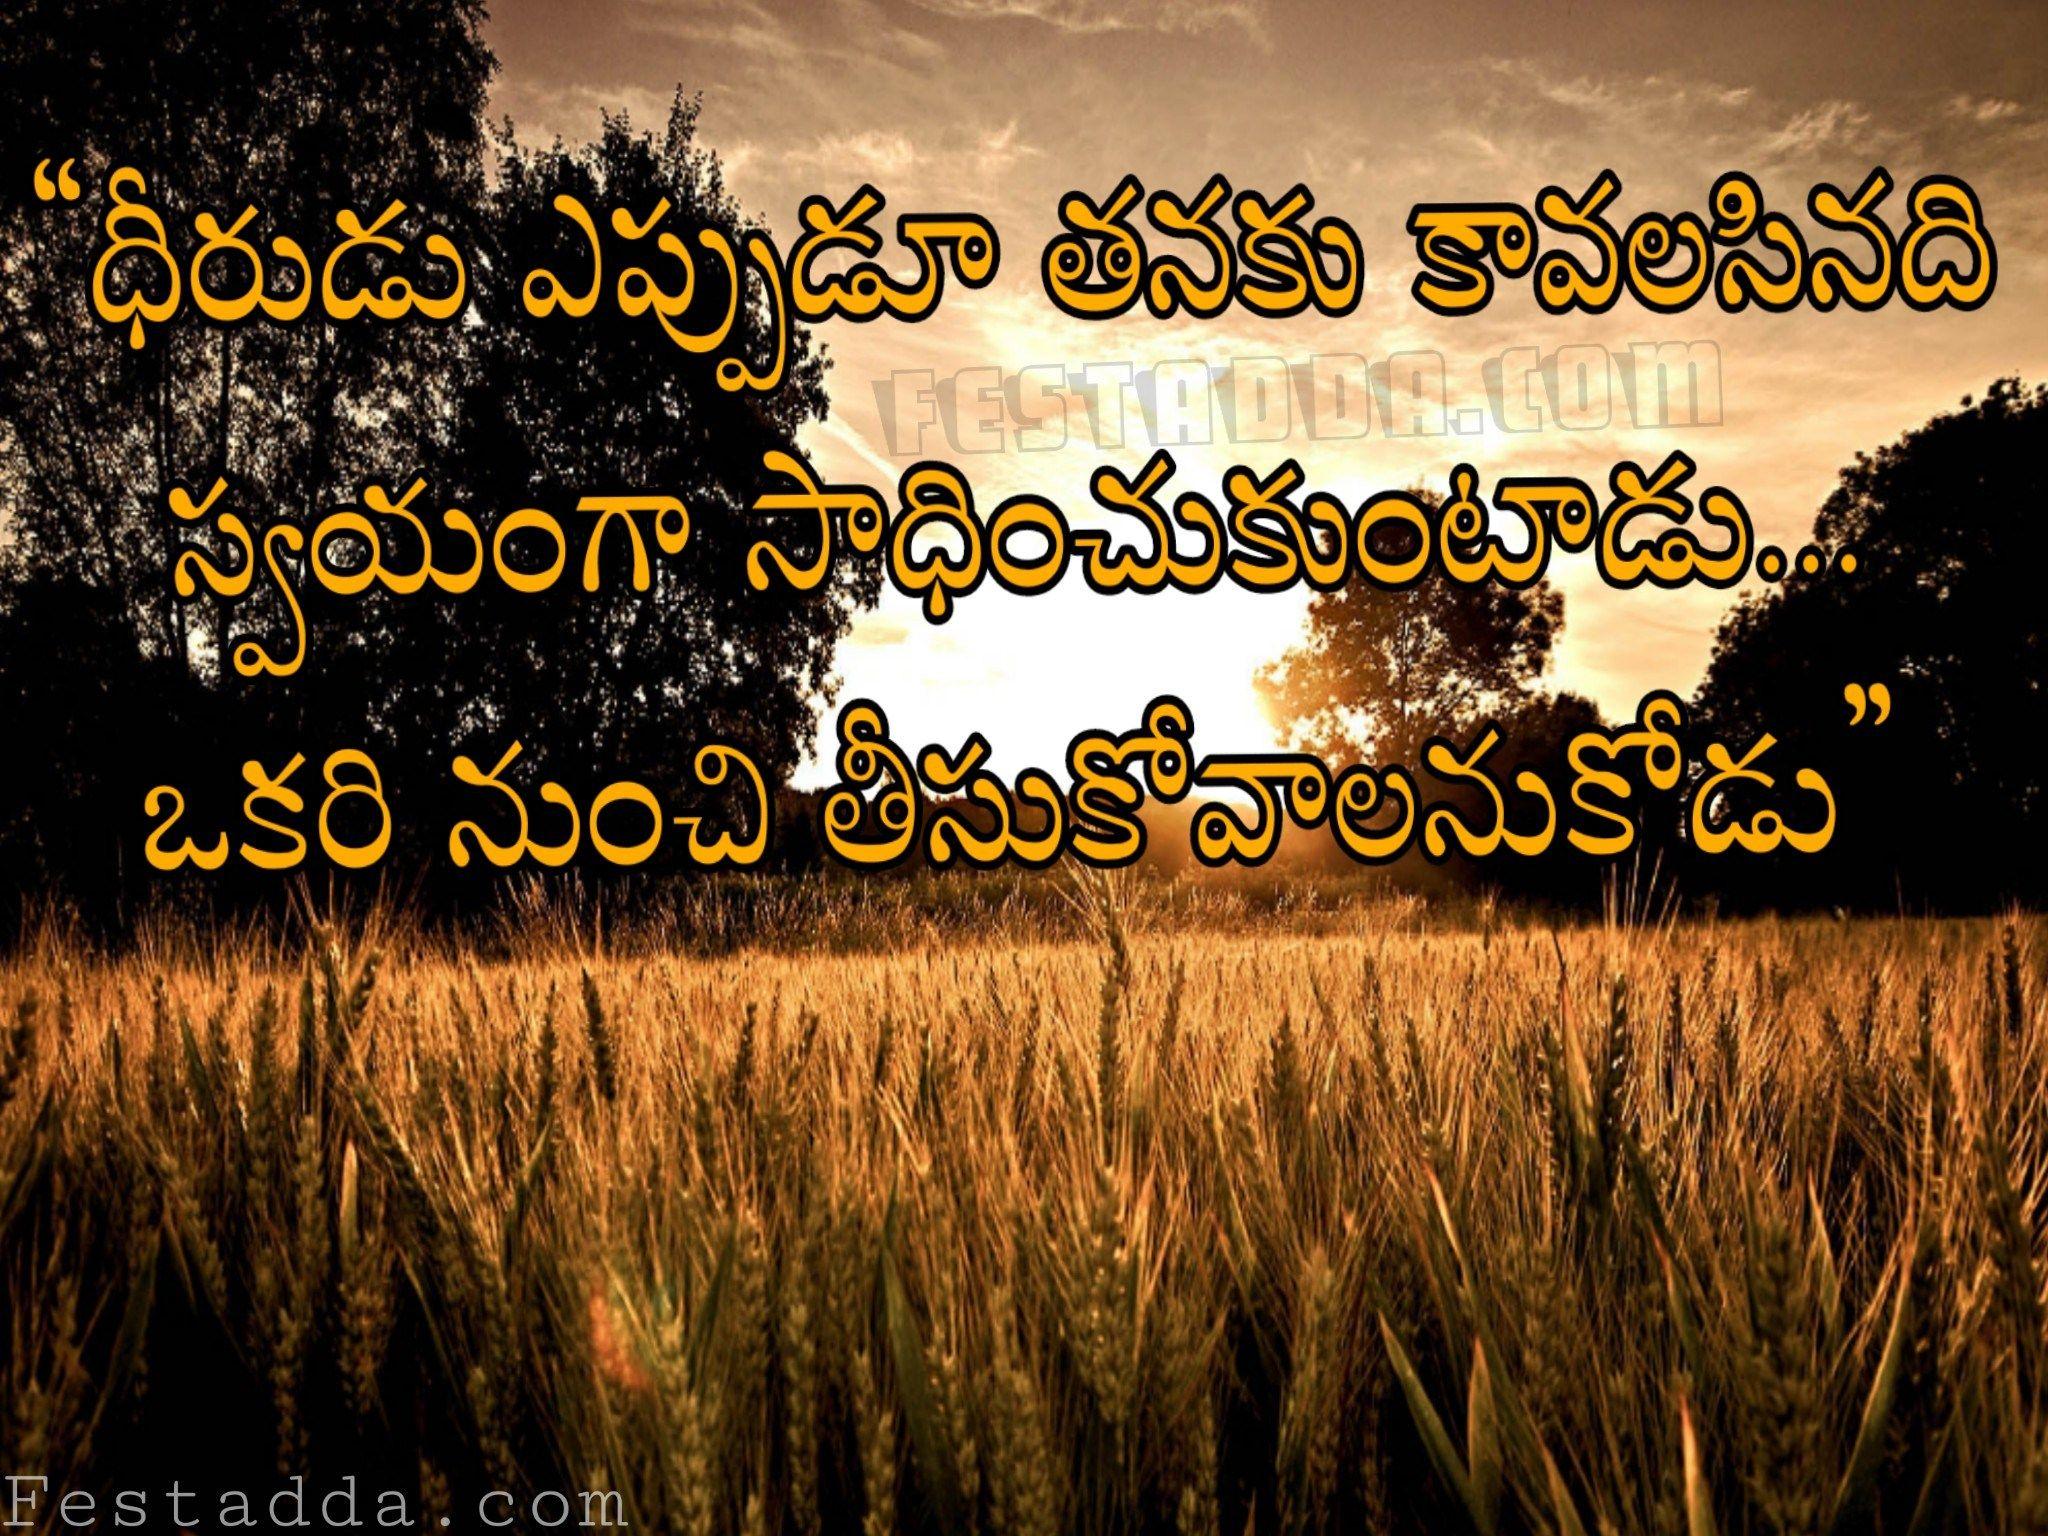 Motivational Quotes In Telugu Pdf Download Successful Life Quotes Quotations Success Images